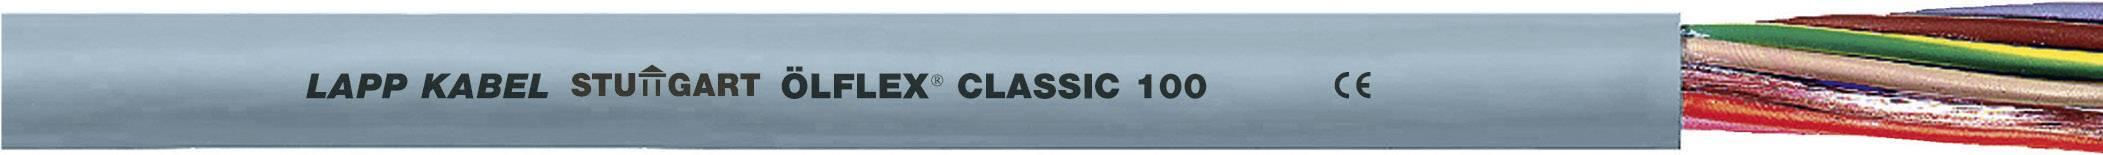 Kabel LappKabel Ölflex CLASSIC 100 3G2,5 (0010087), PVC, 9,6 mm, 750 V, šedá, 100 m